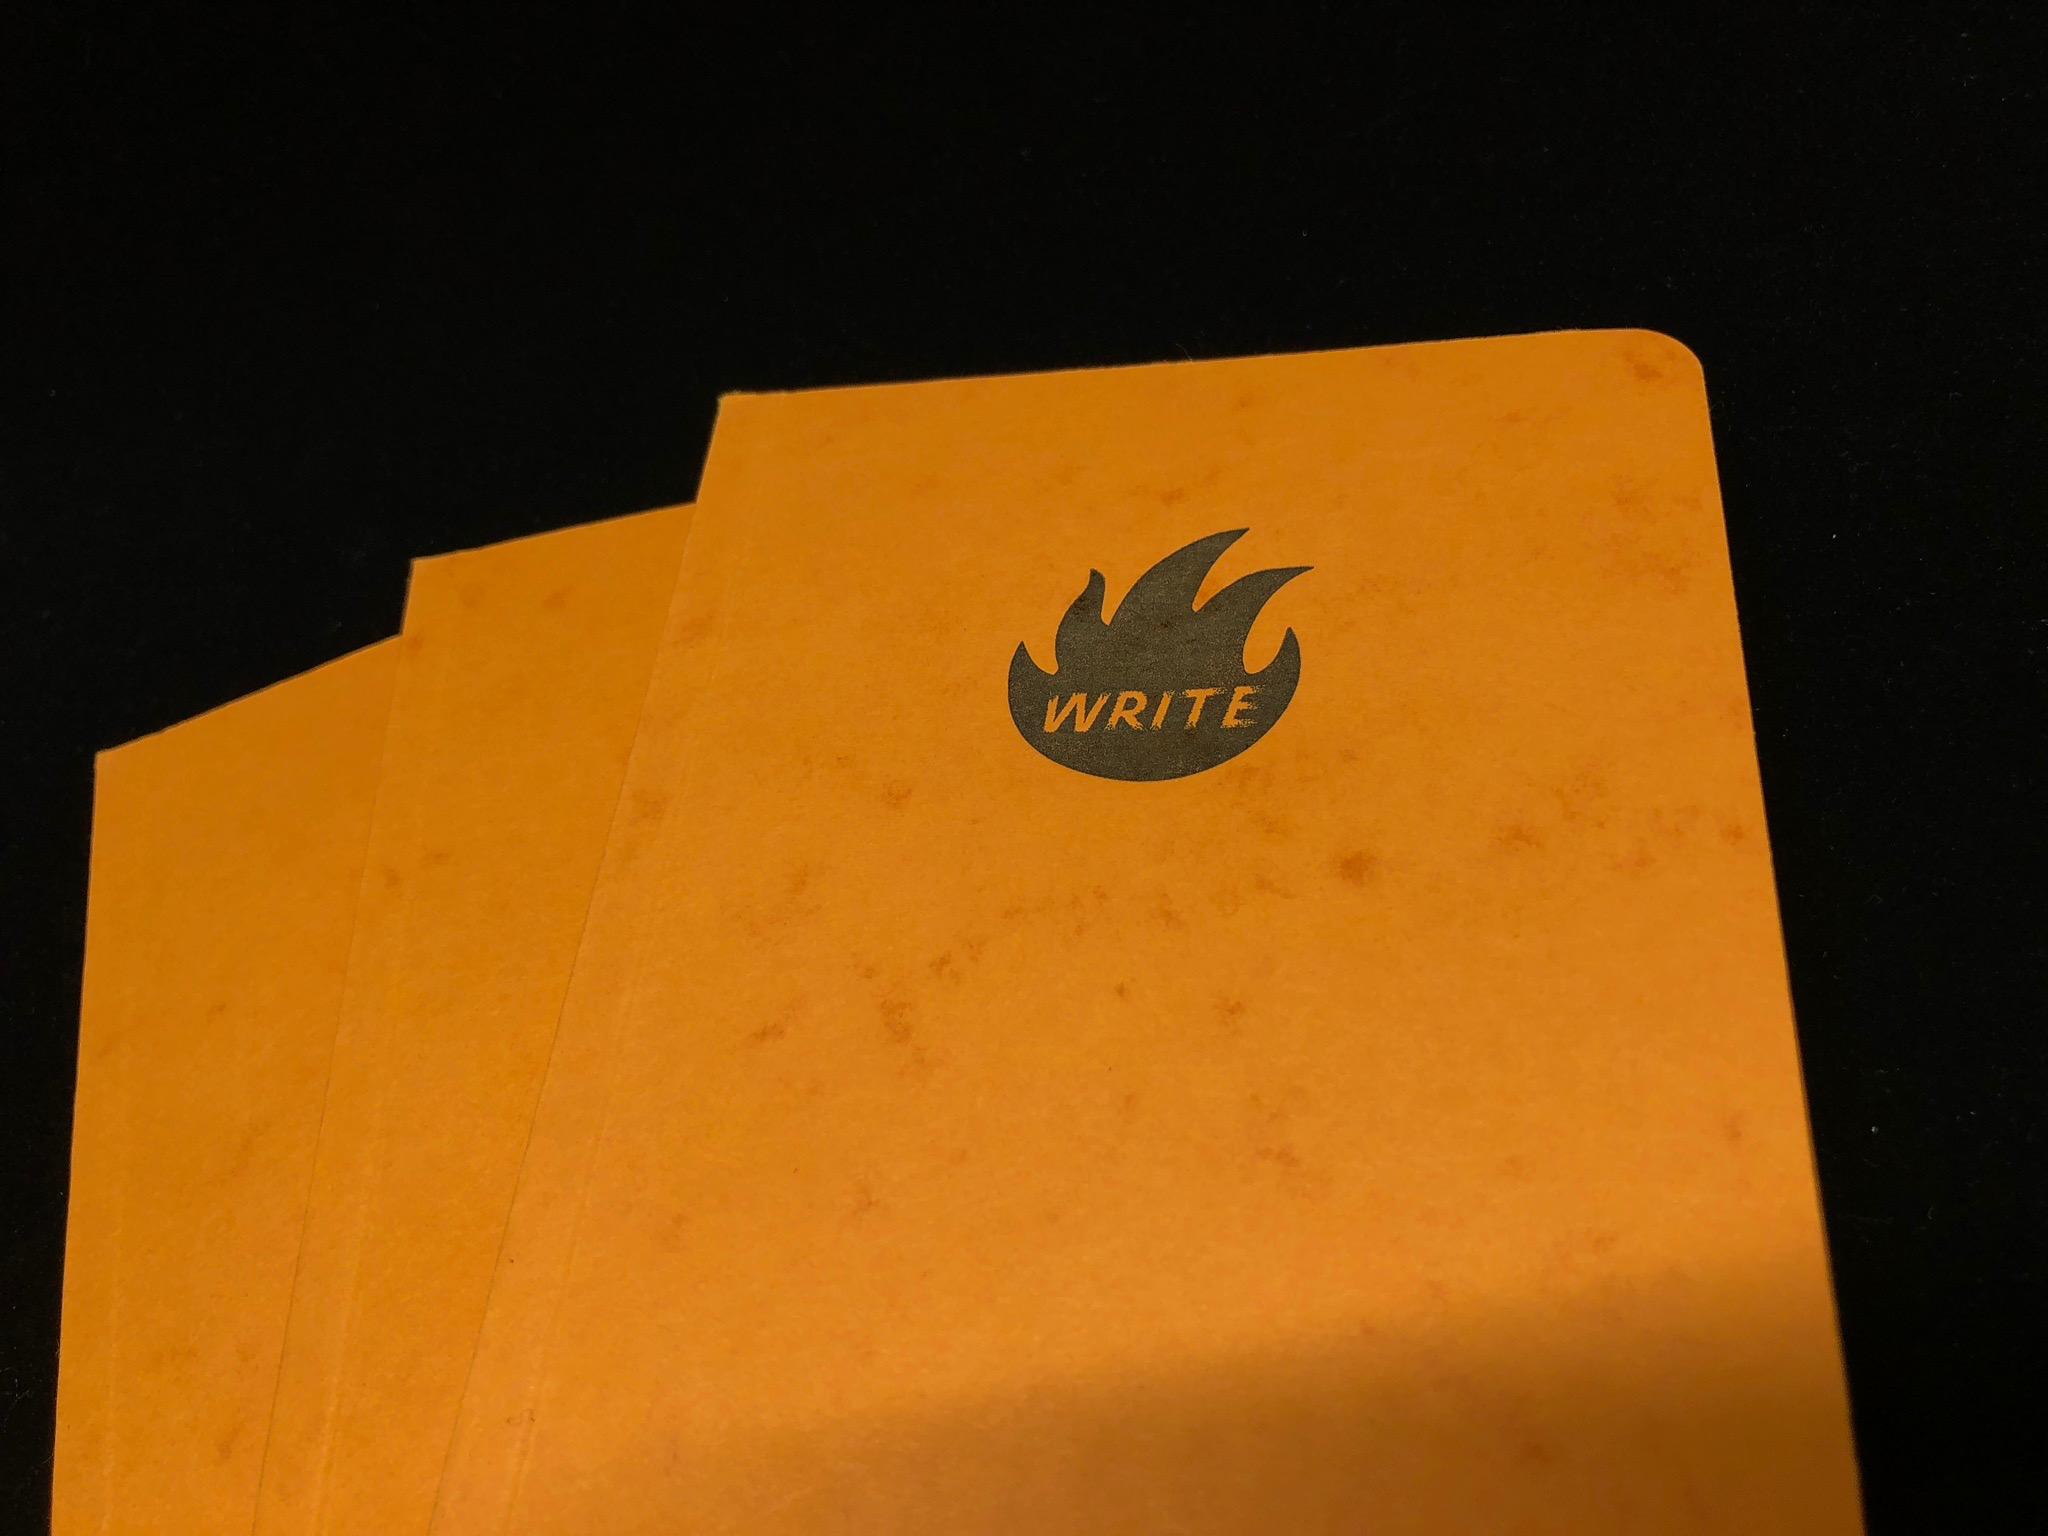 write-notepads-kindred-spirit-notebook-1.jpg